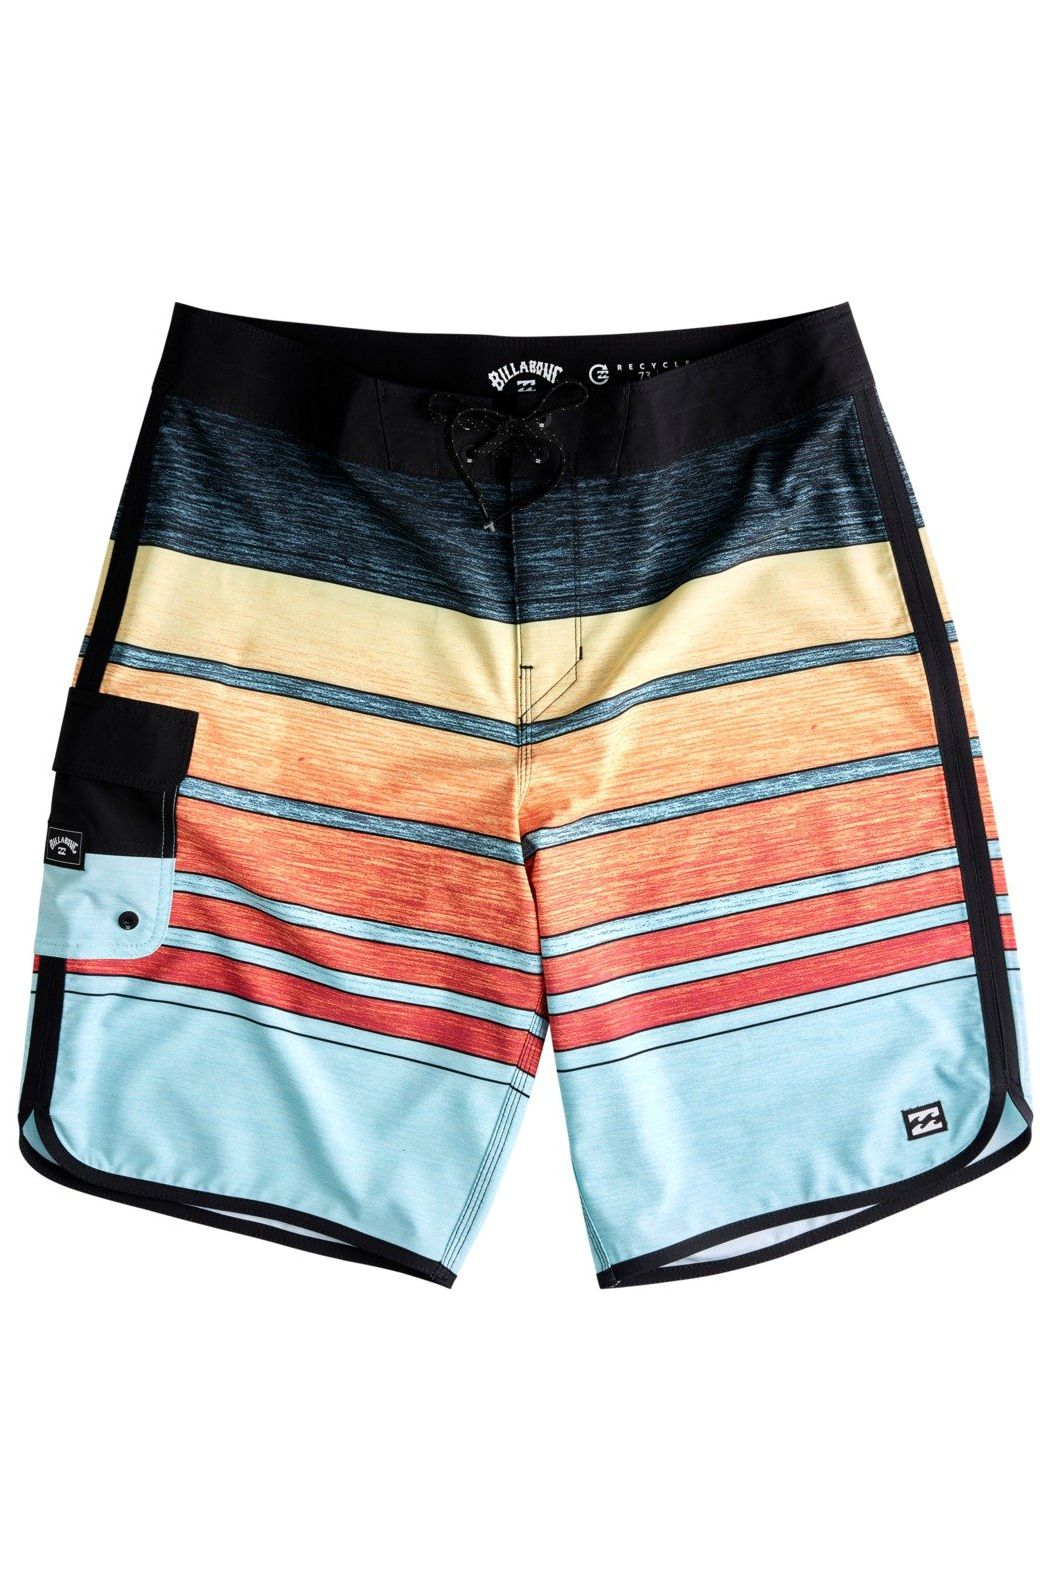 Boardshorts Billabong 73 STRIPE PRO BOY Neon